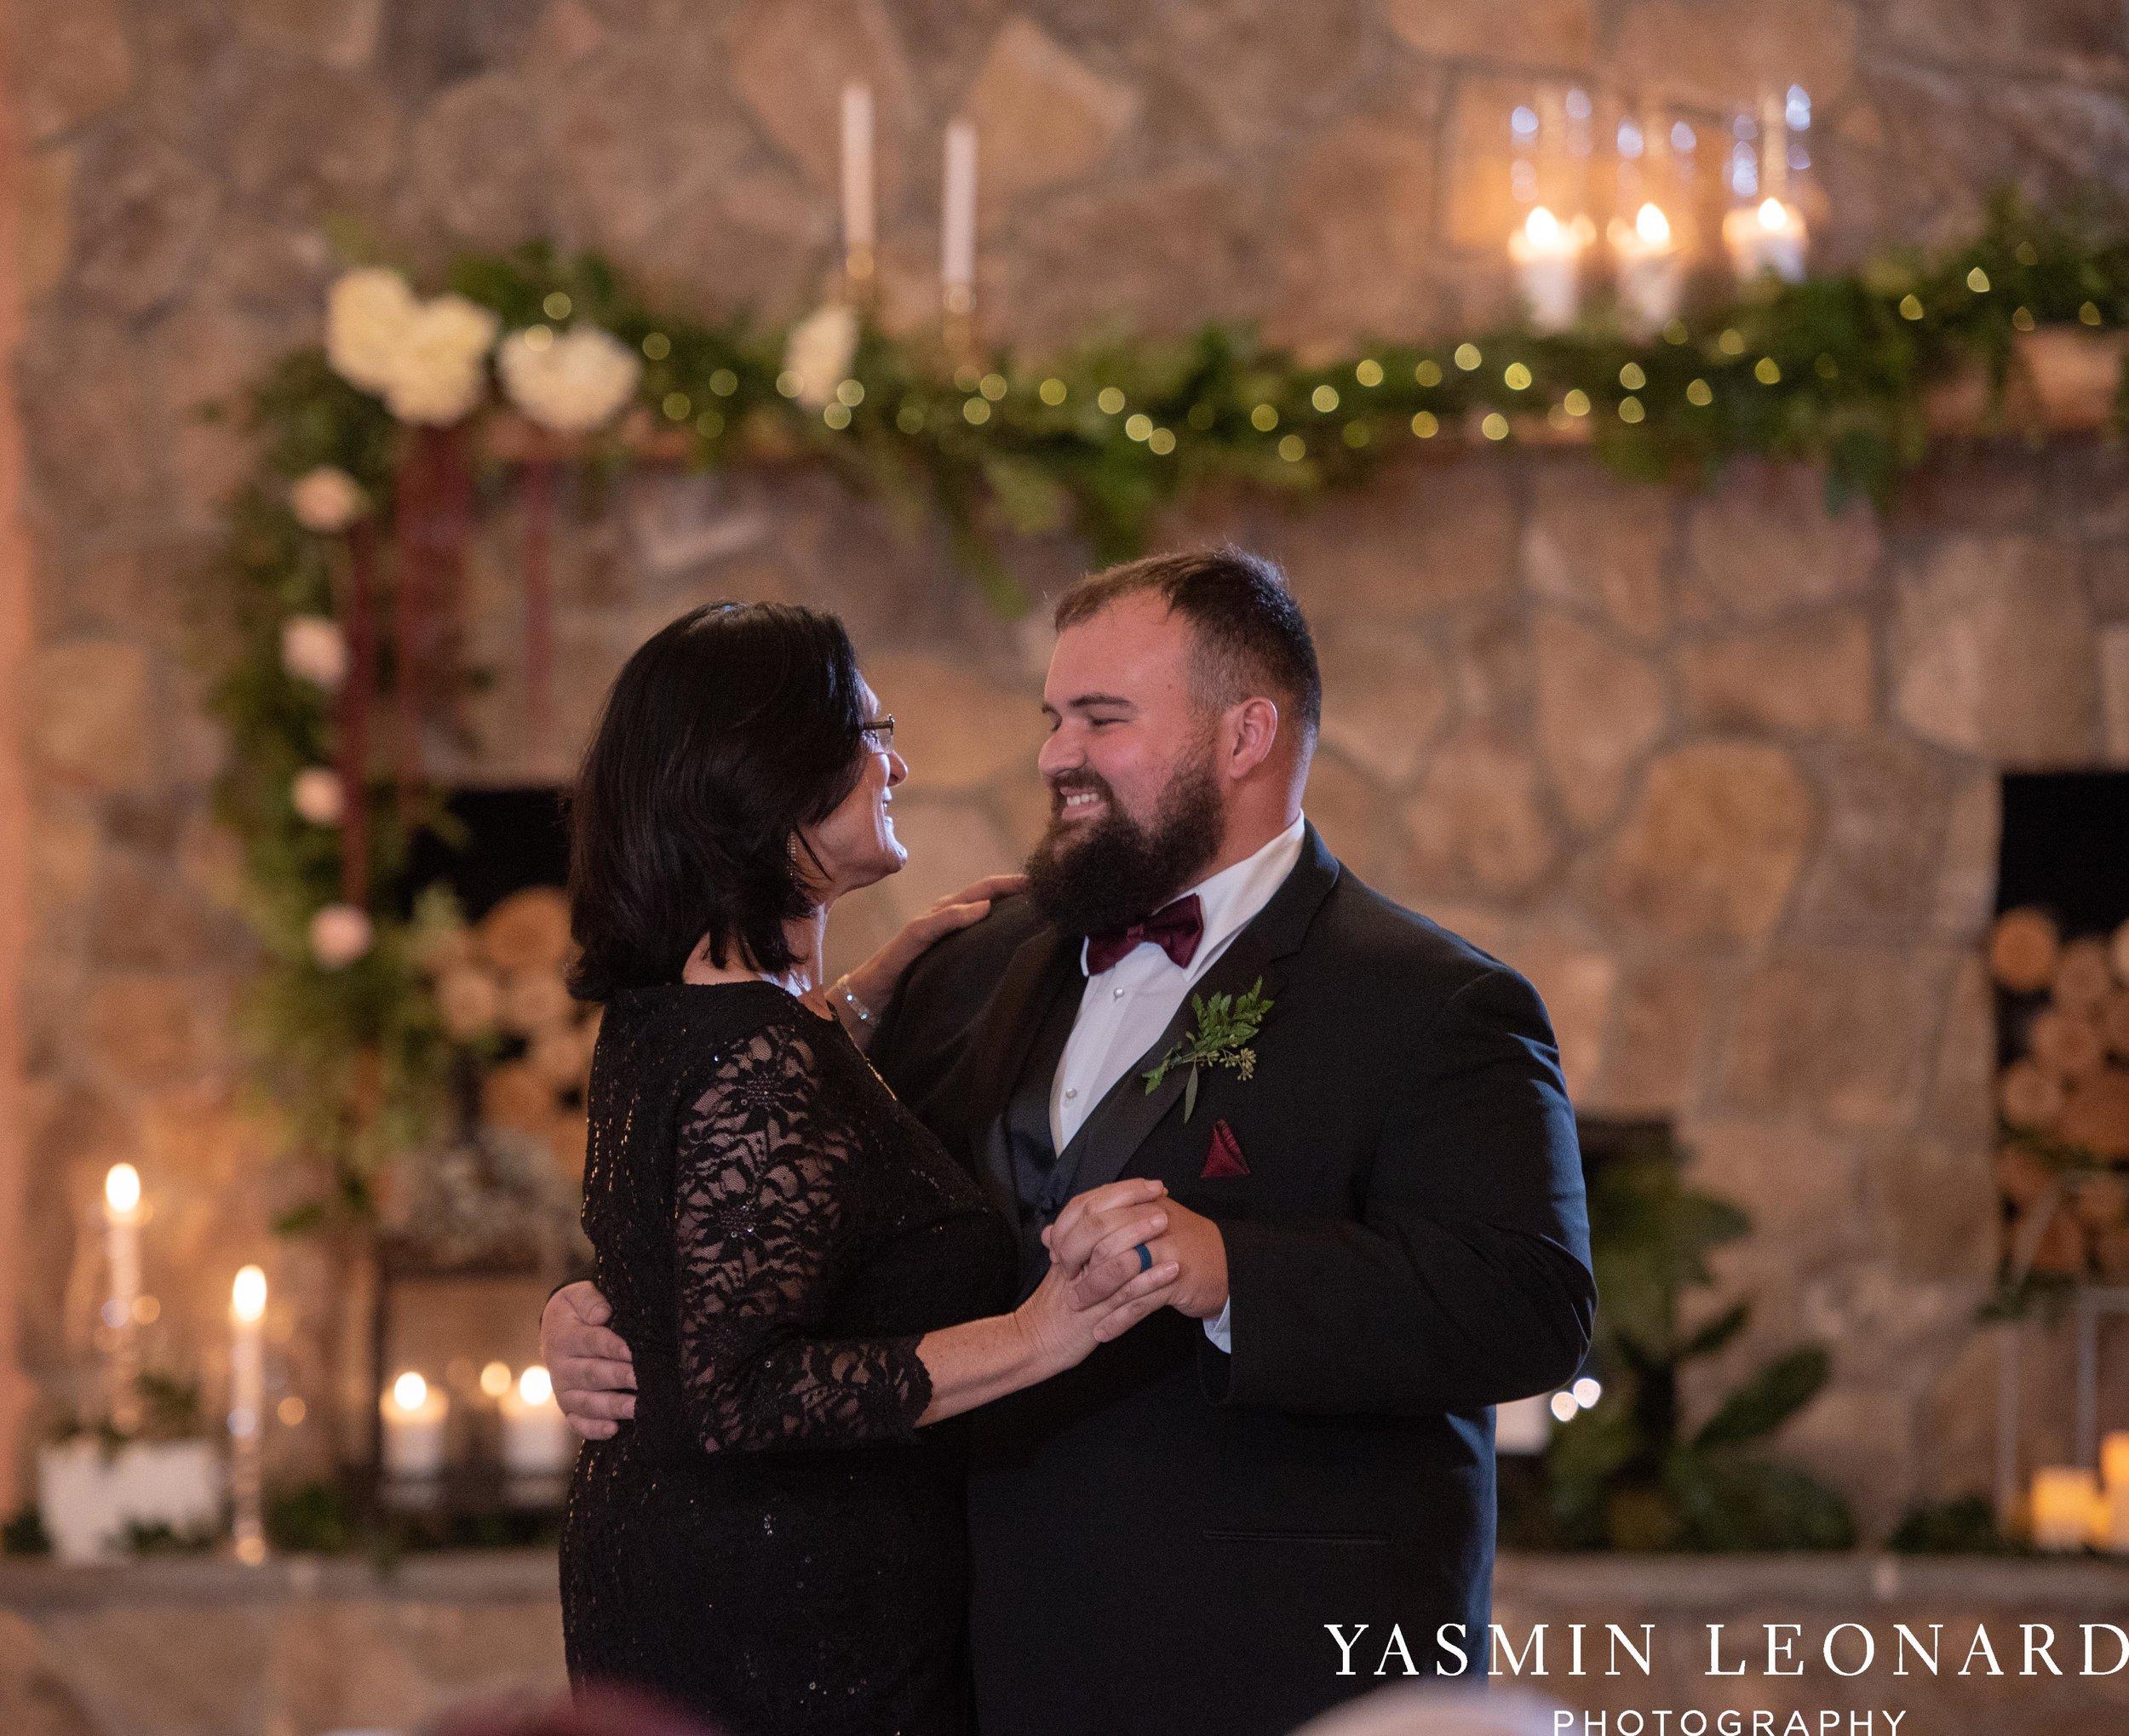 Wesley Memorial United Methodist Church - Old Homeplace Winery - High Point Weddings - High Point Wedding Photographer - NC Weddings - NC Barn Venue - Yasmin Leonard Photography-57.jpg